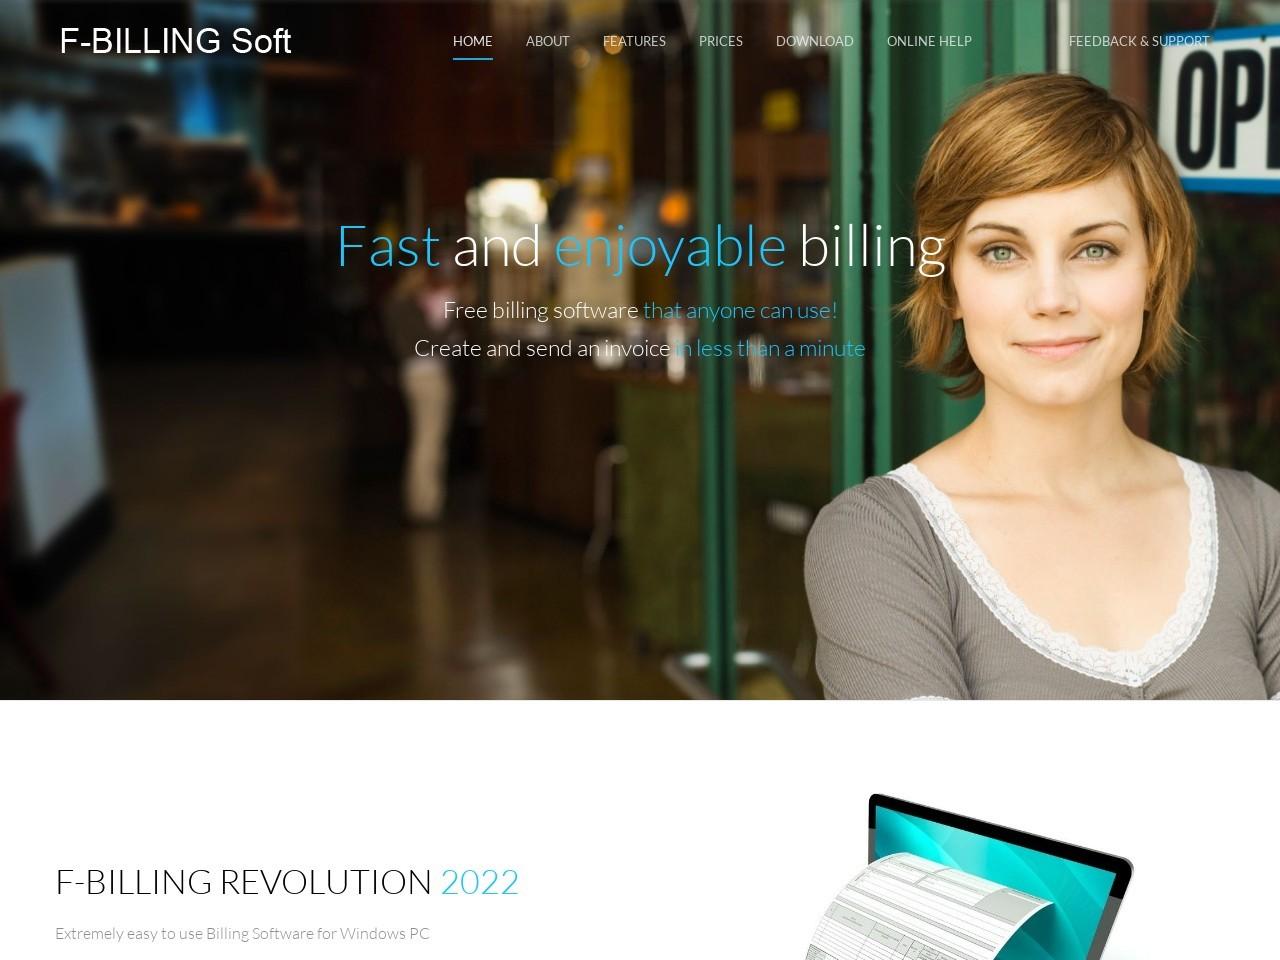 F-Billing Software